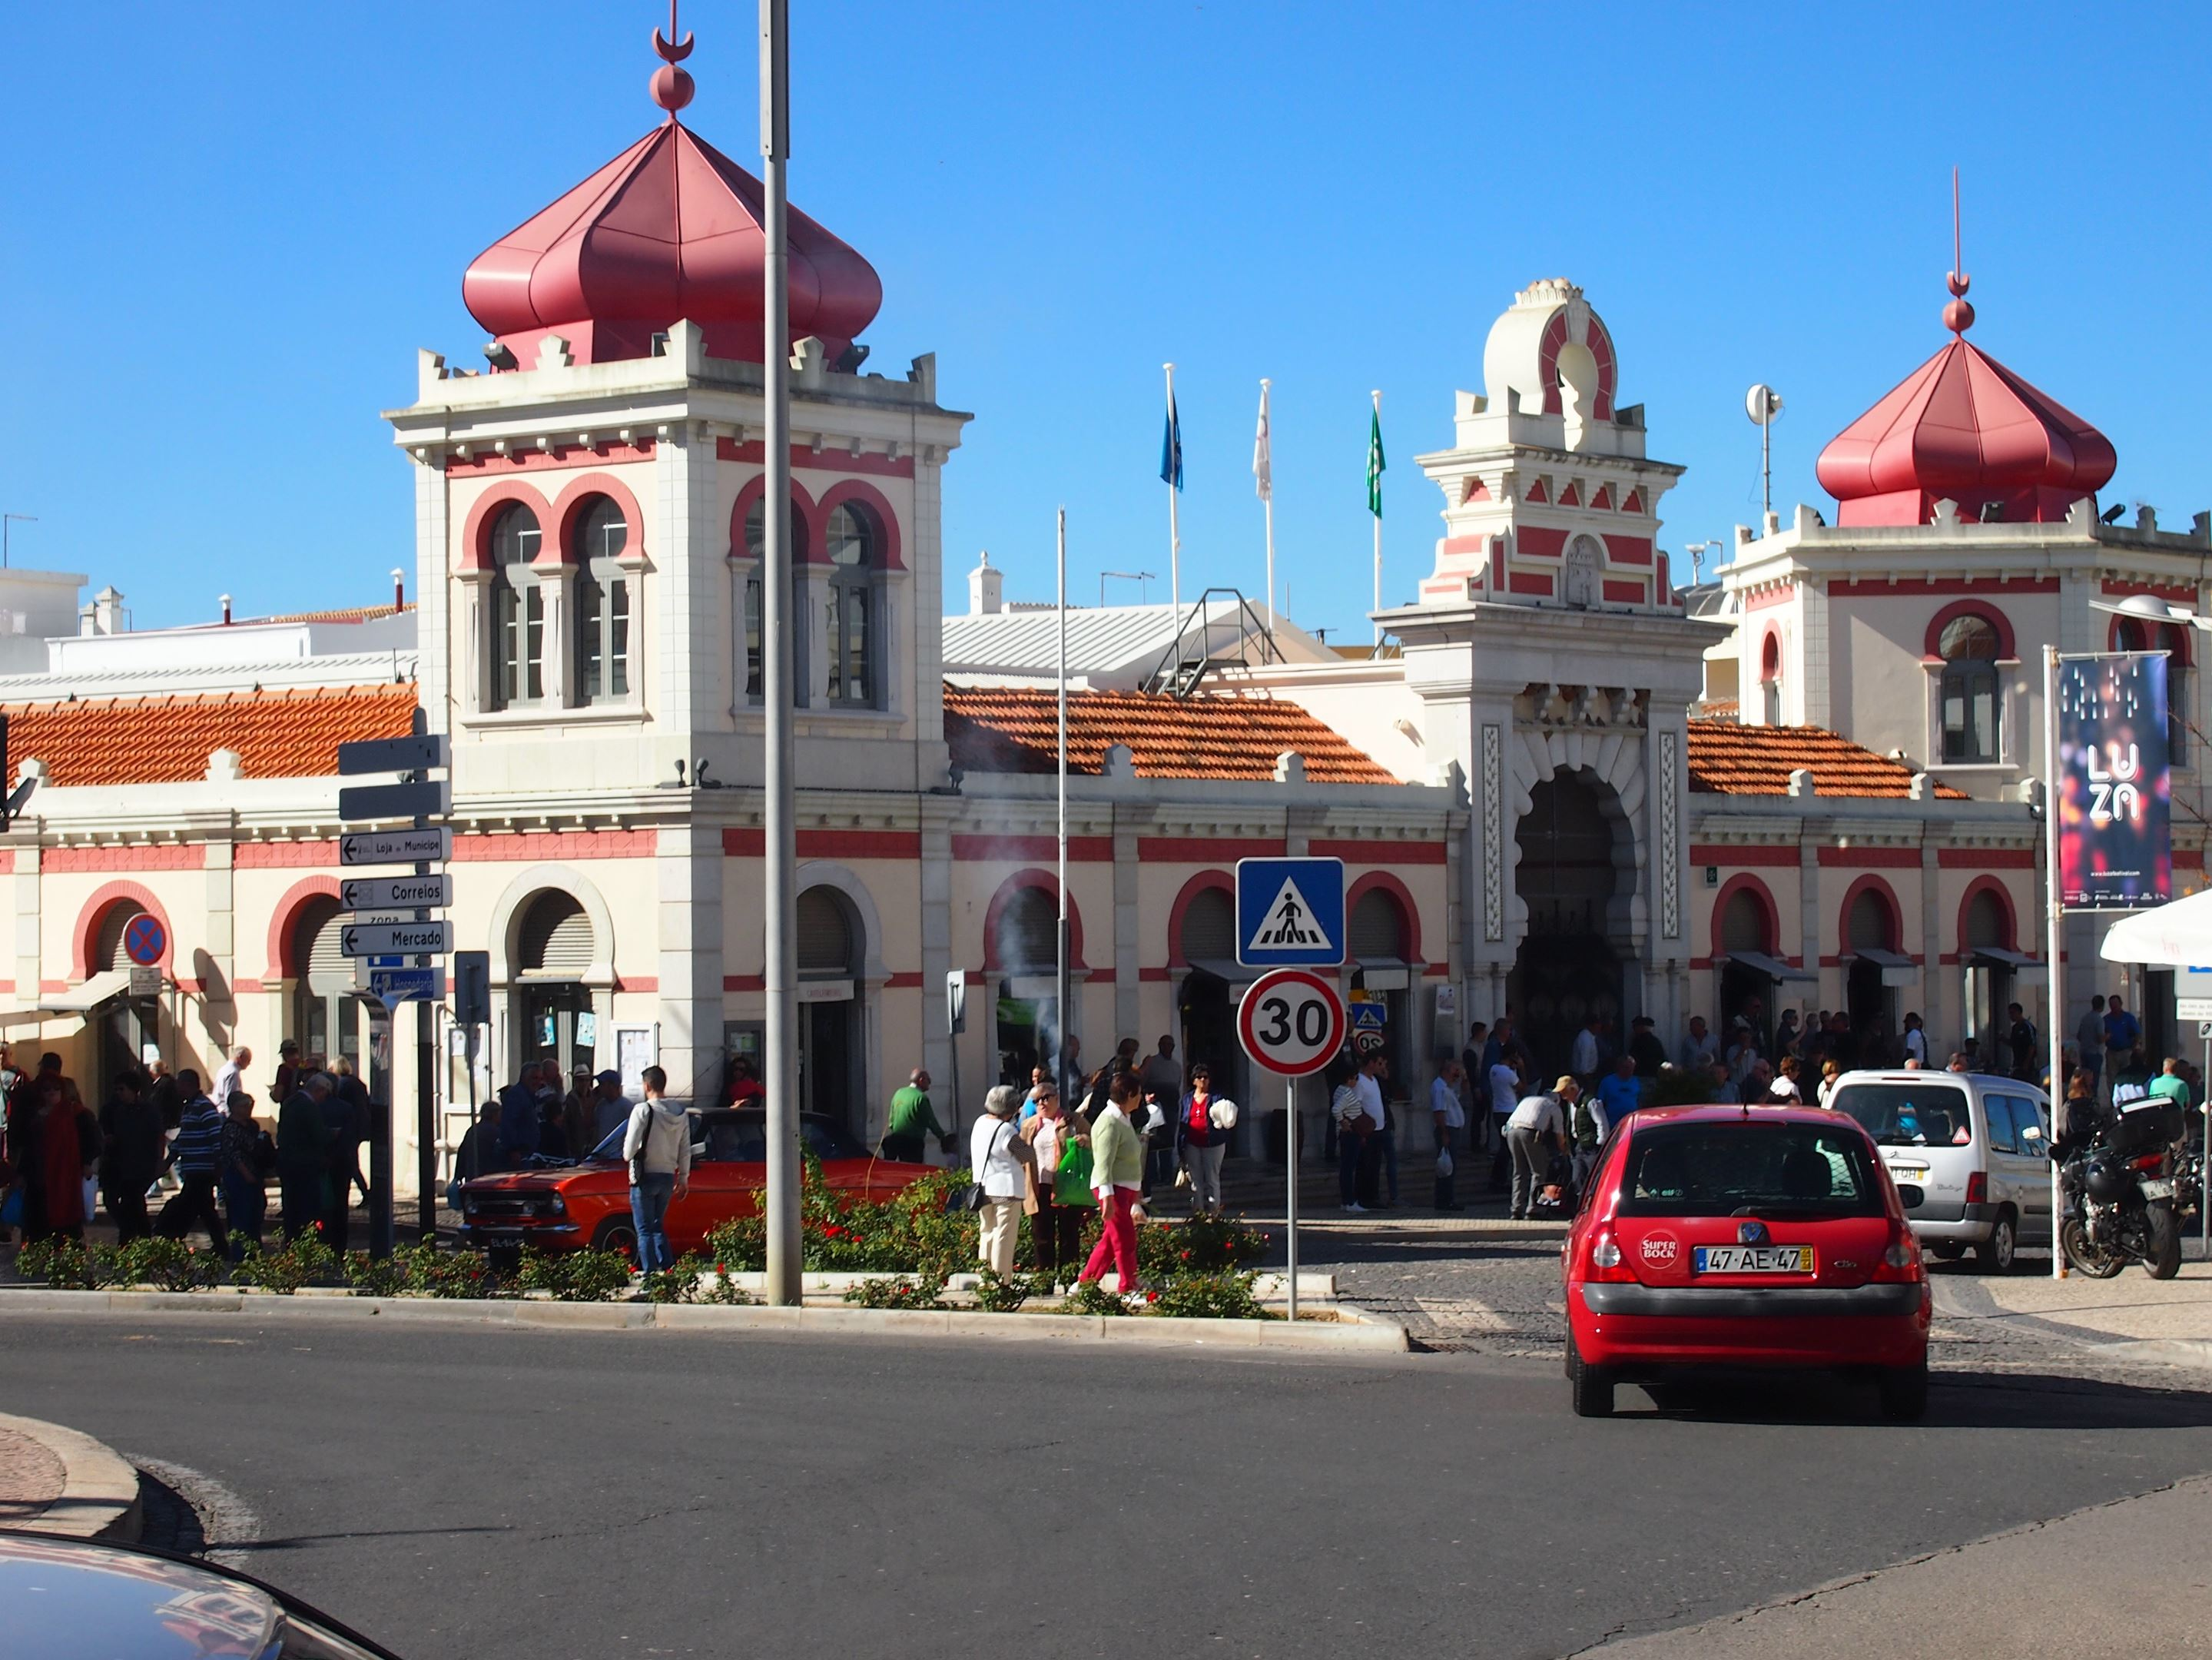 Mercado Municipal de Loulé, Algarve